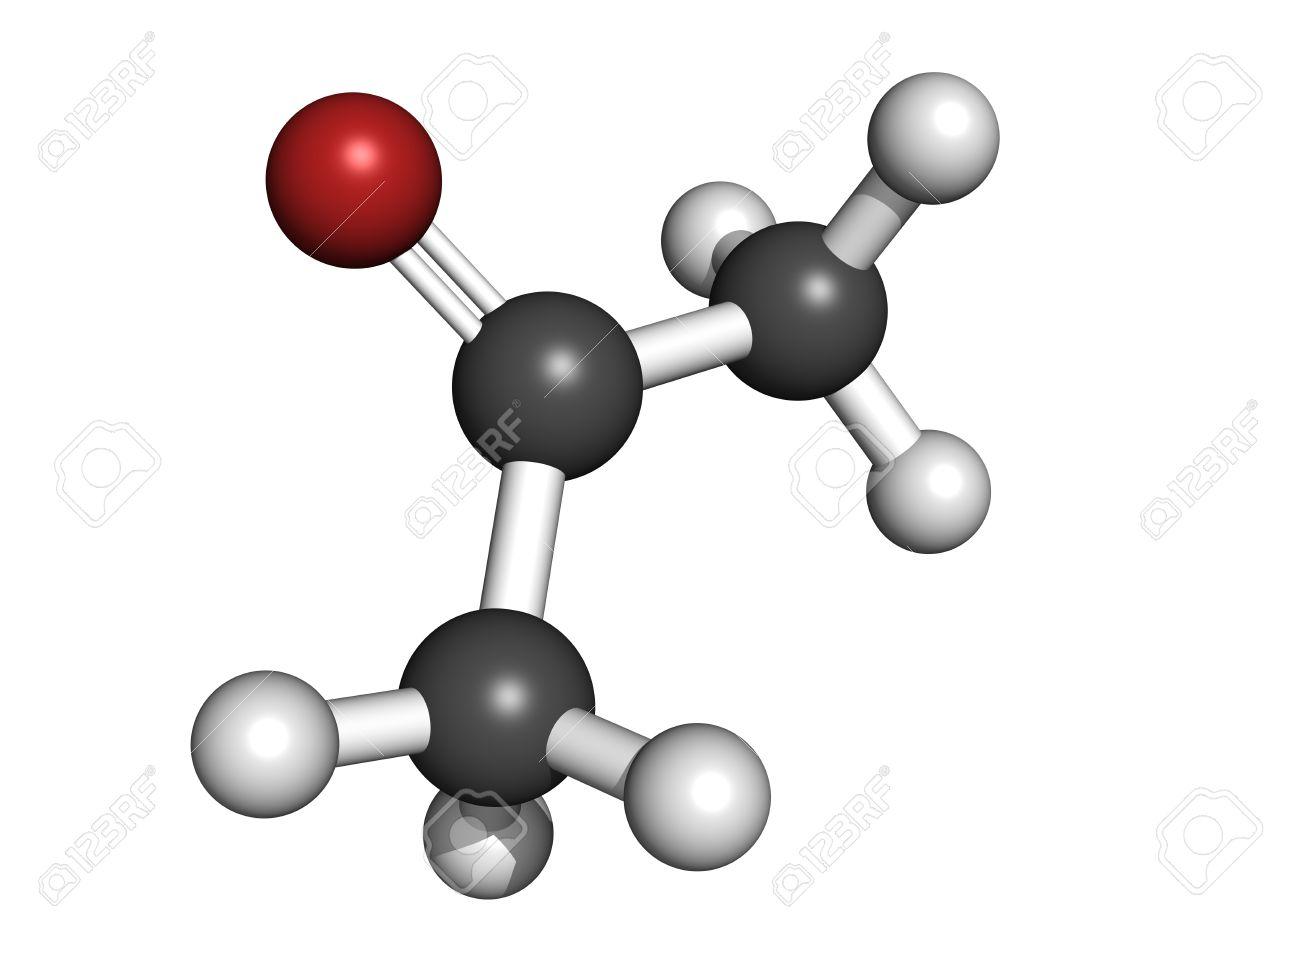 acetone solvent molecule molecular model atoms are represented